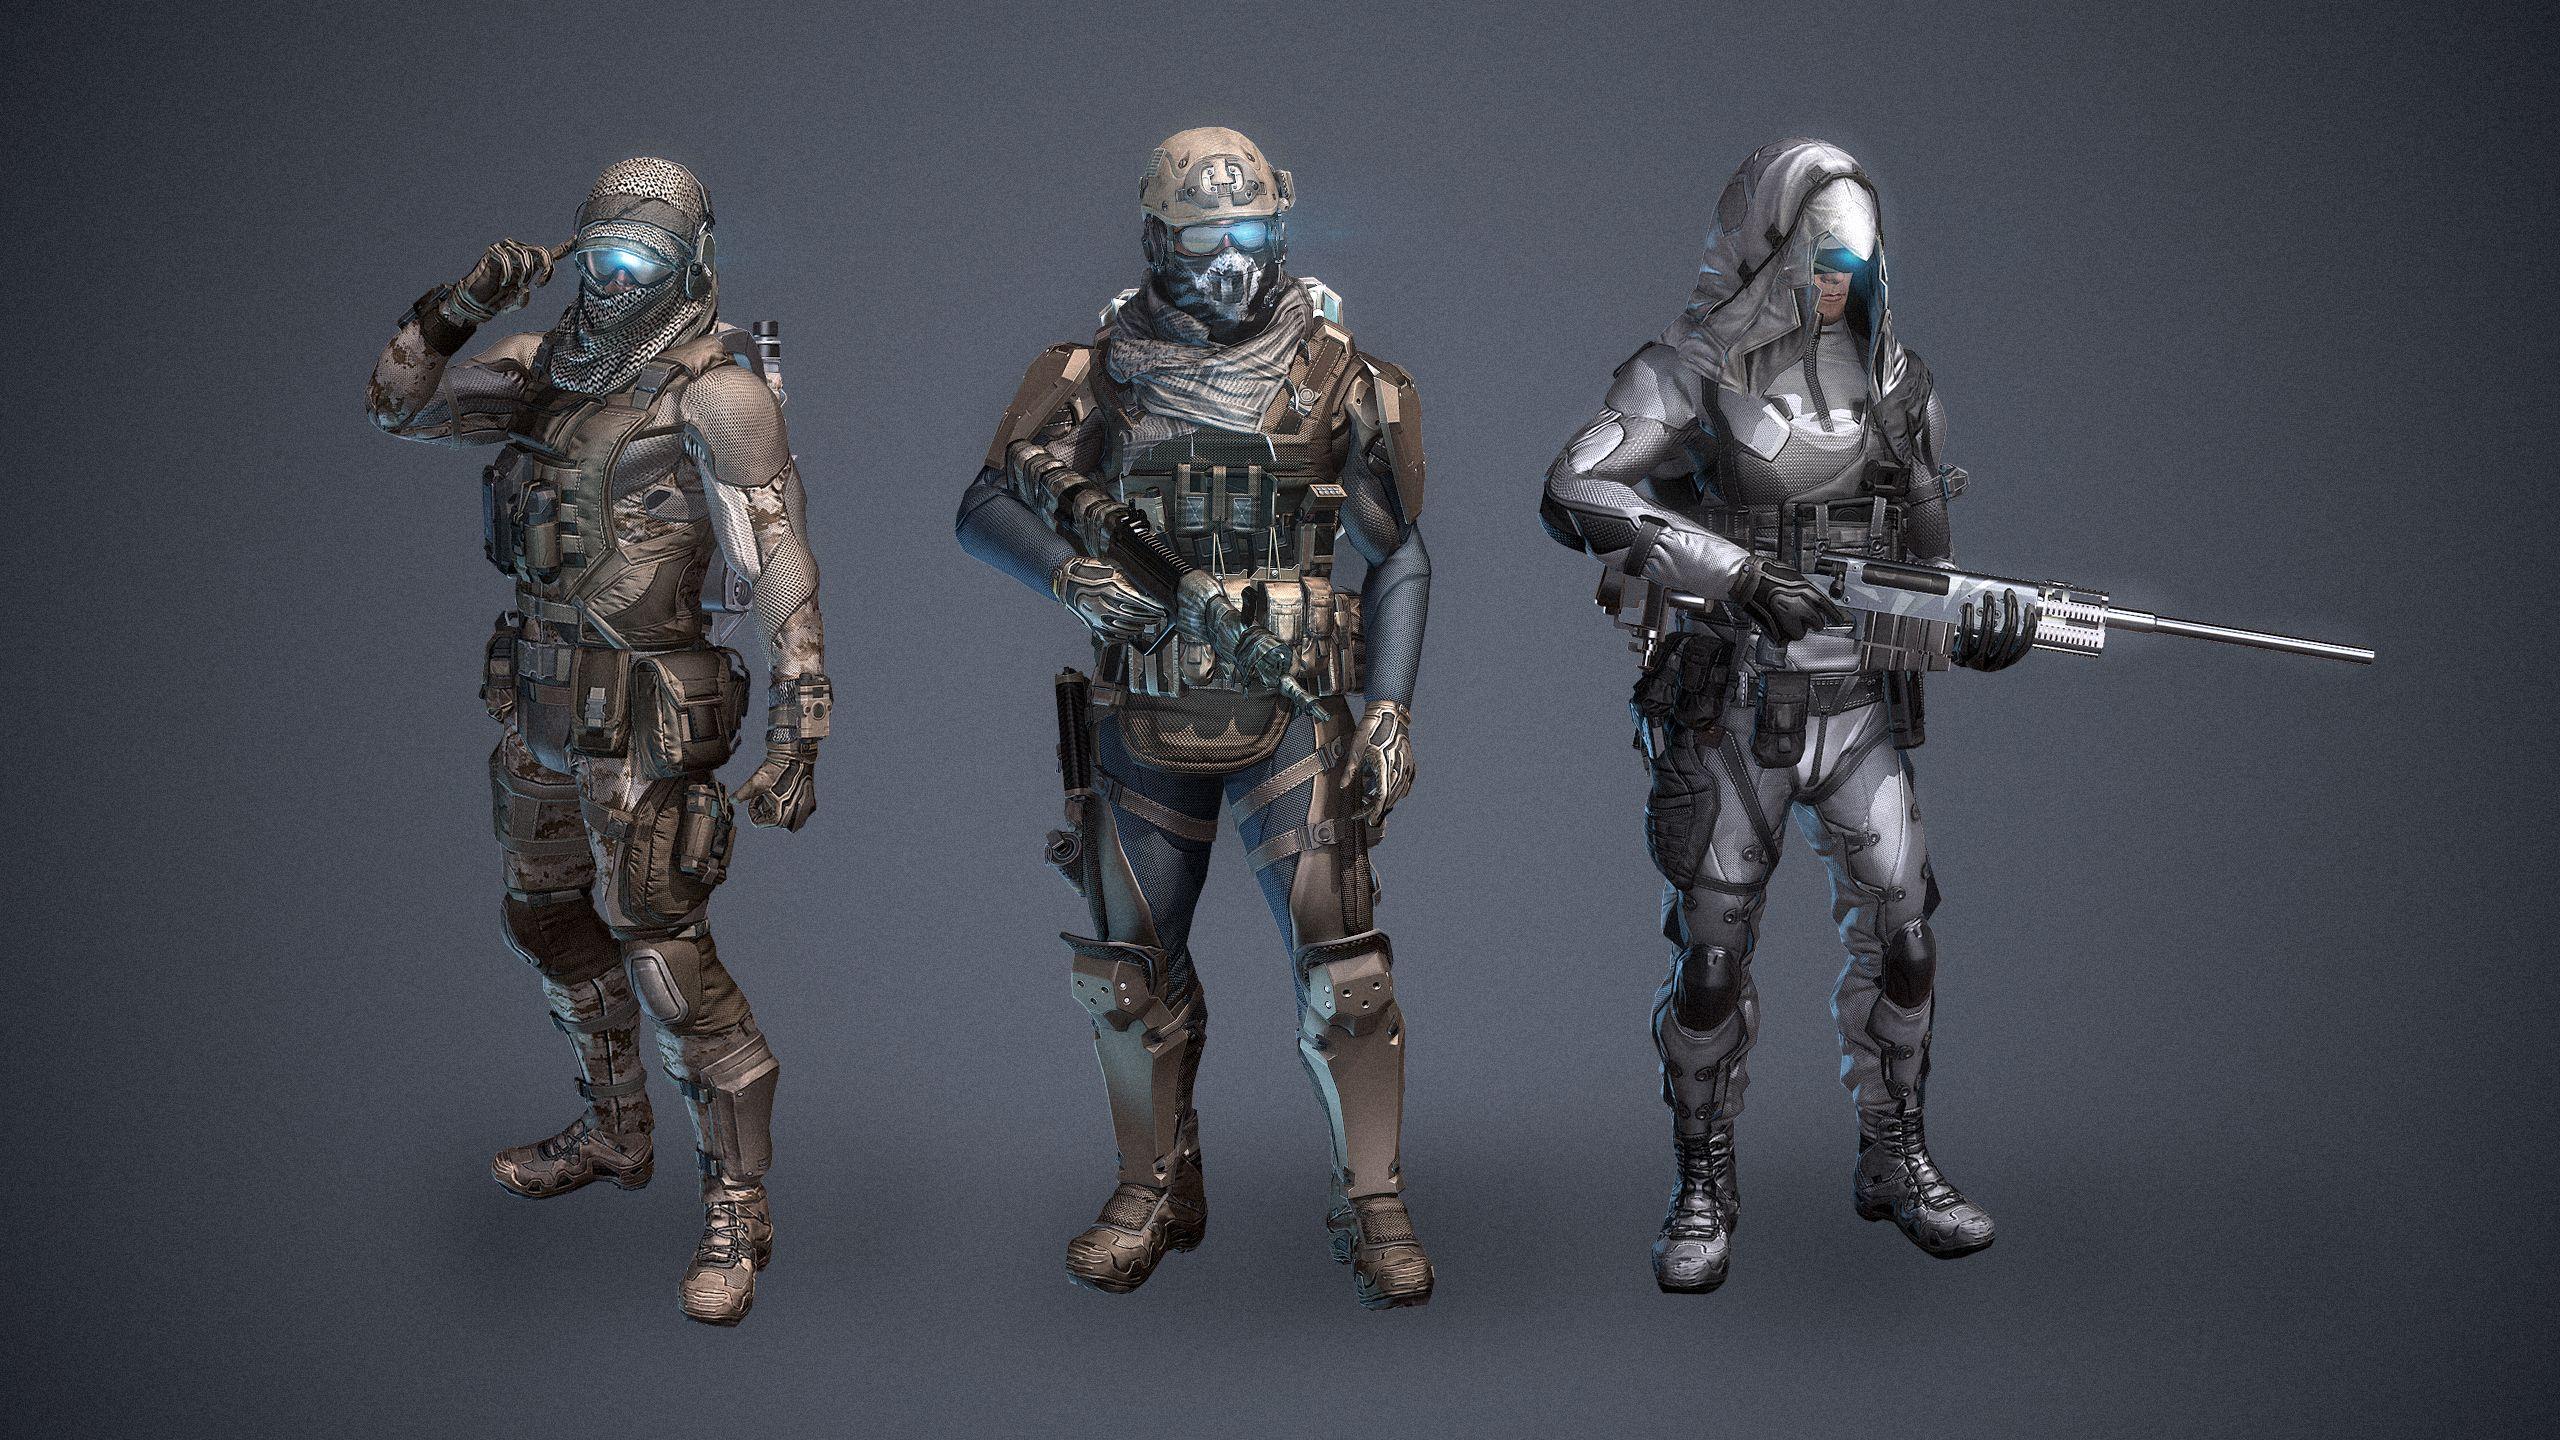 Concept Art | Media | Ghost Recon Phantoms | Official Website (Ubisoft, 2014)